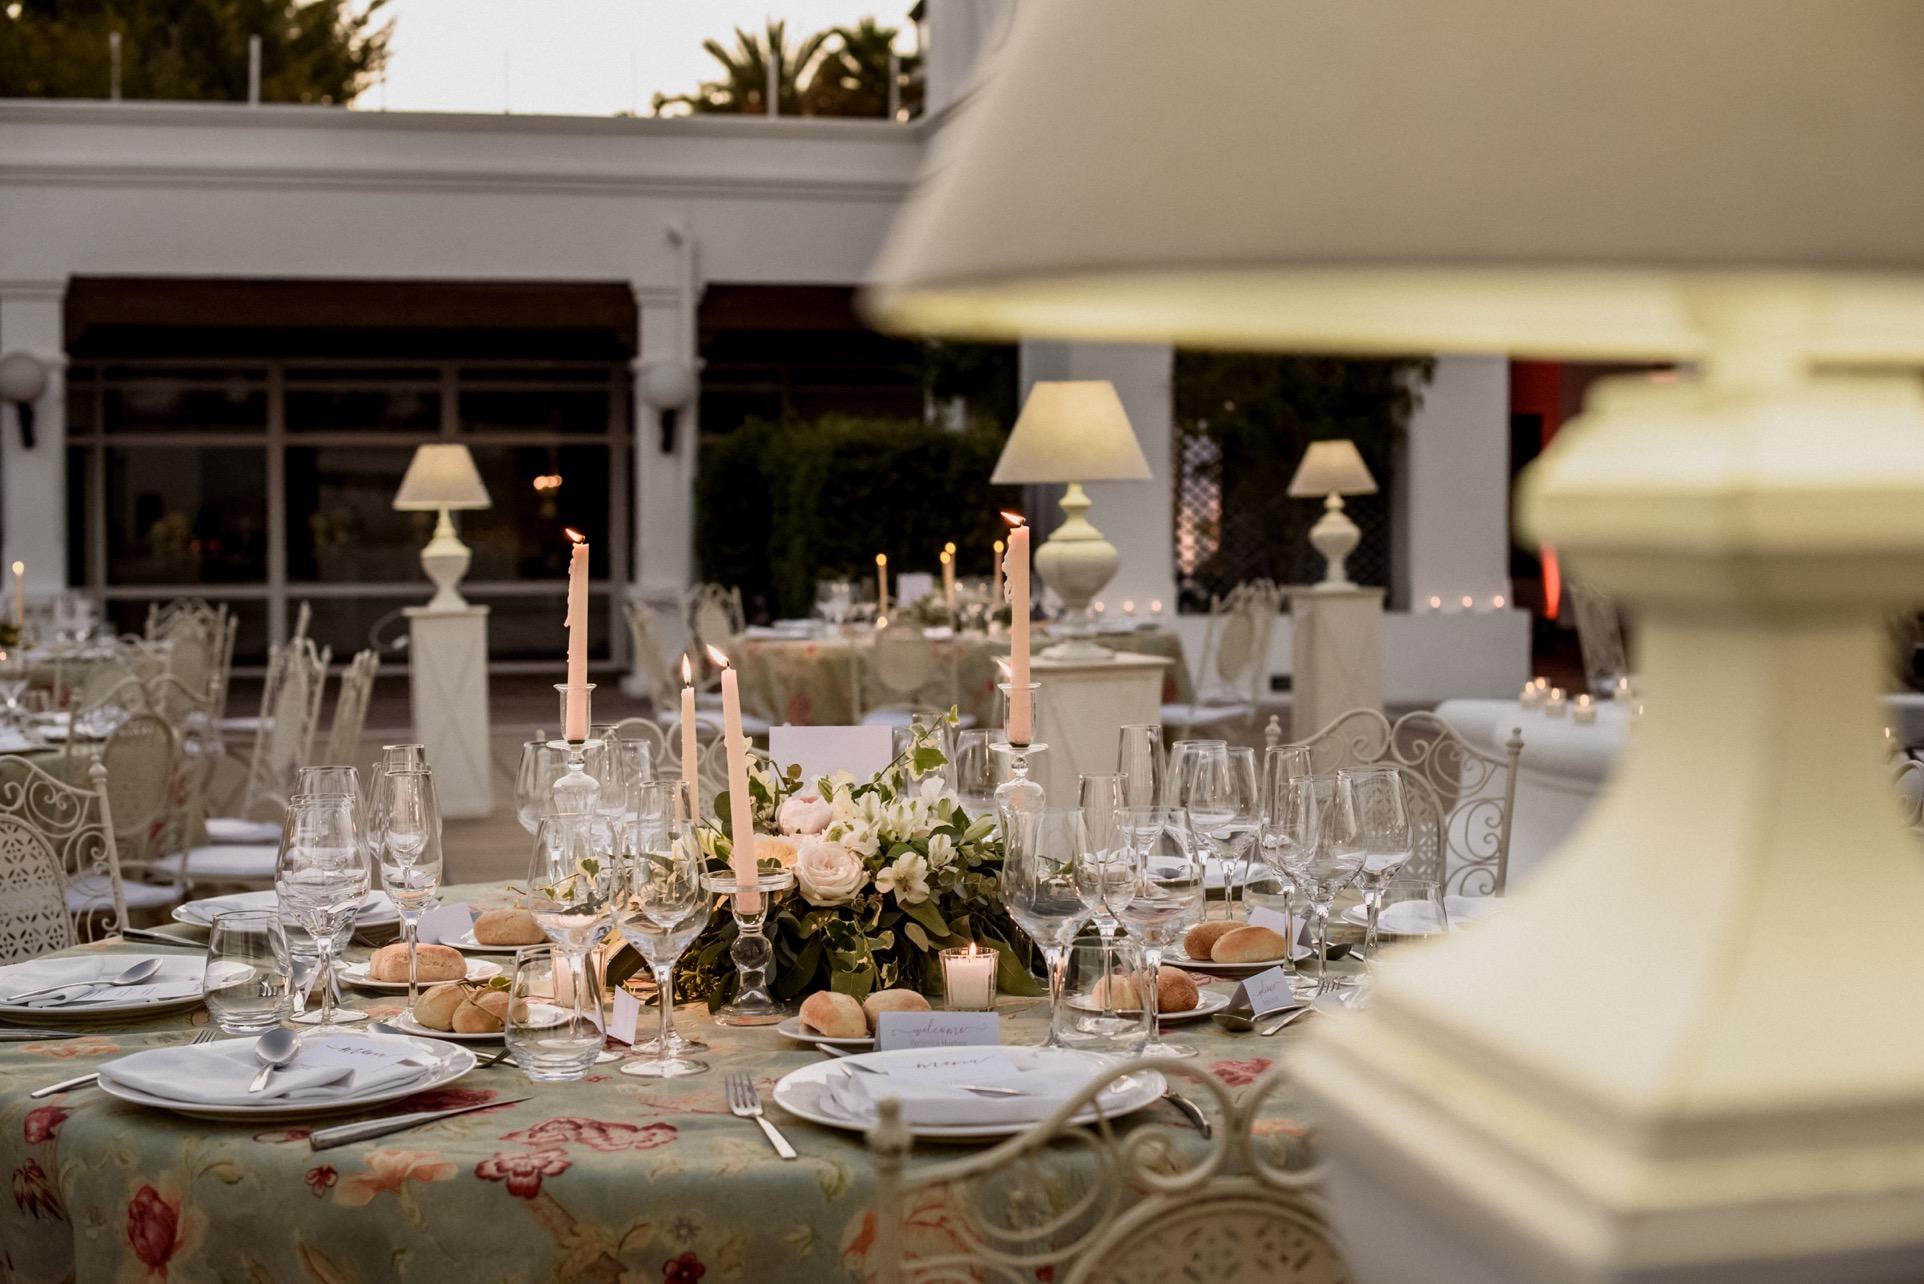 Si-Quiero-Wedding-Planner-By-Sira-Antequera-Bodas-Málaga-Marbella-Miami-12